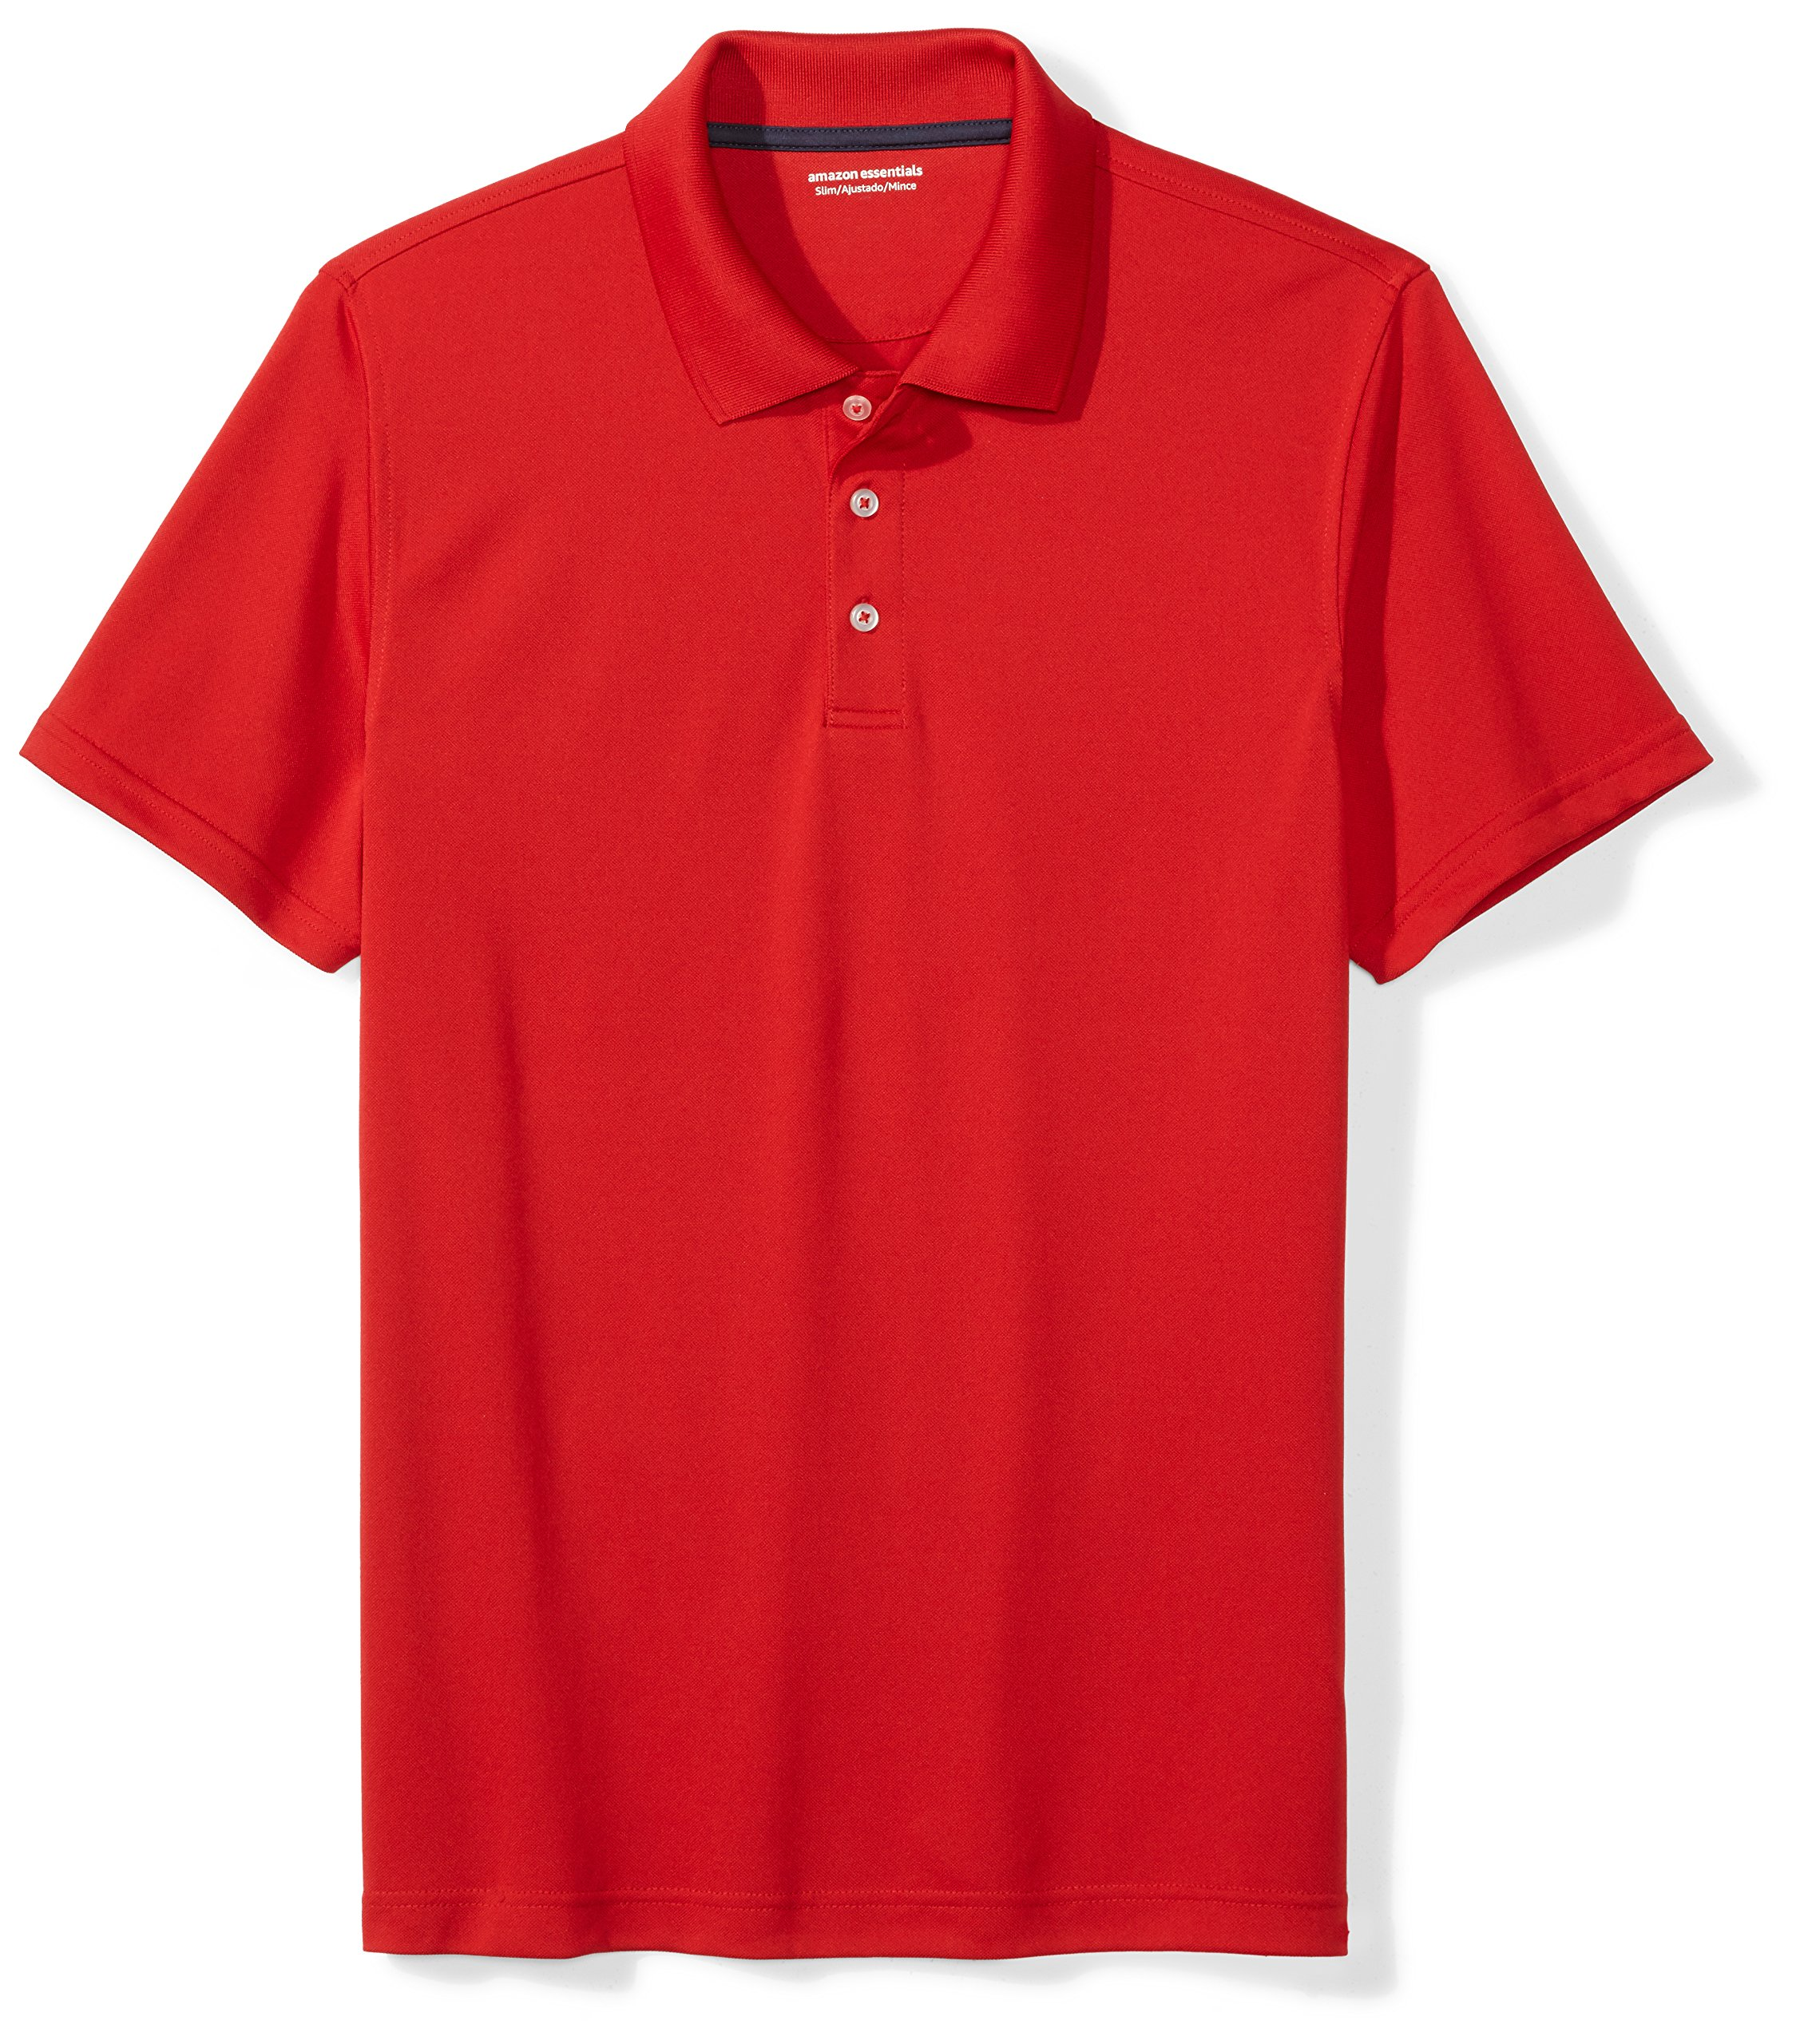 Amazon Essentials Men's Slim-Fit Quick-Dry Golf Polo Shirt, Red, Medium by Amazon Essentials